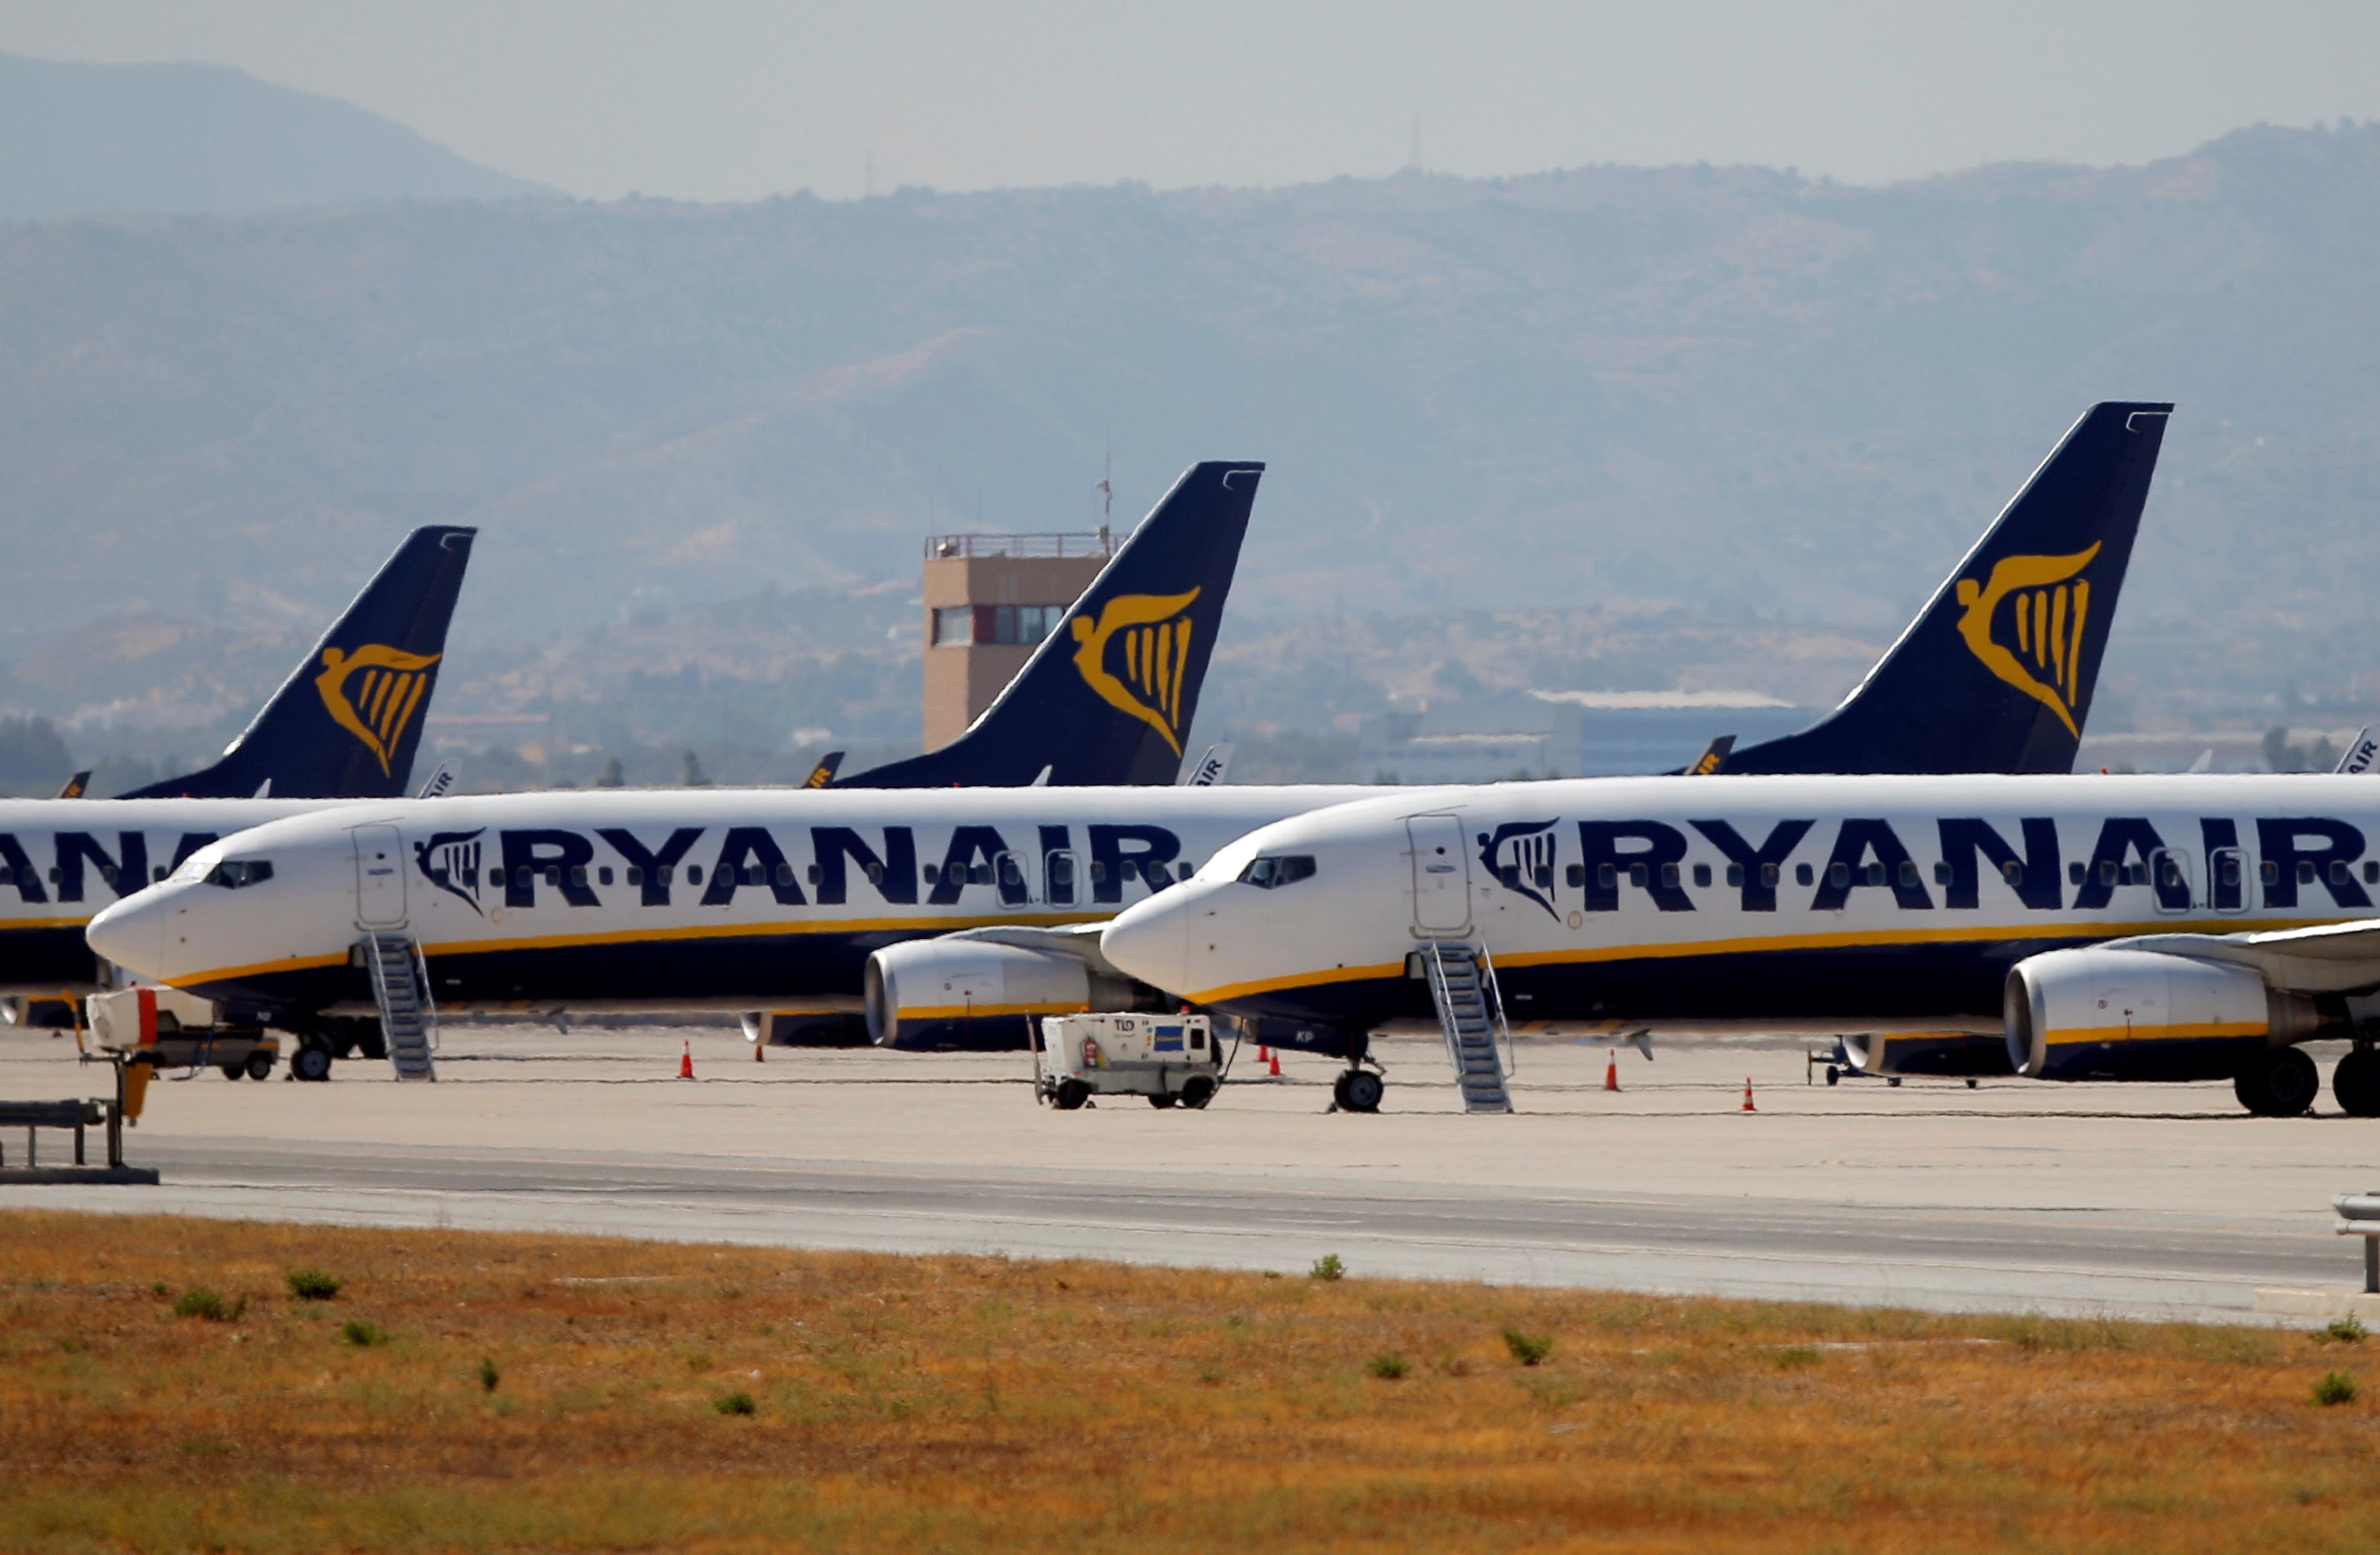 Ryanair to cut 3,000 jobs as coronavirus grounds flights